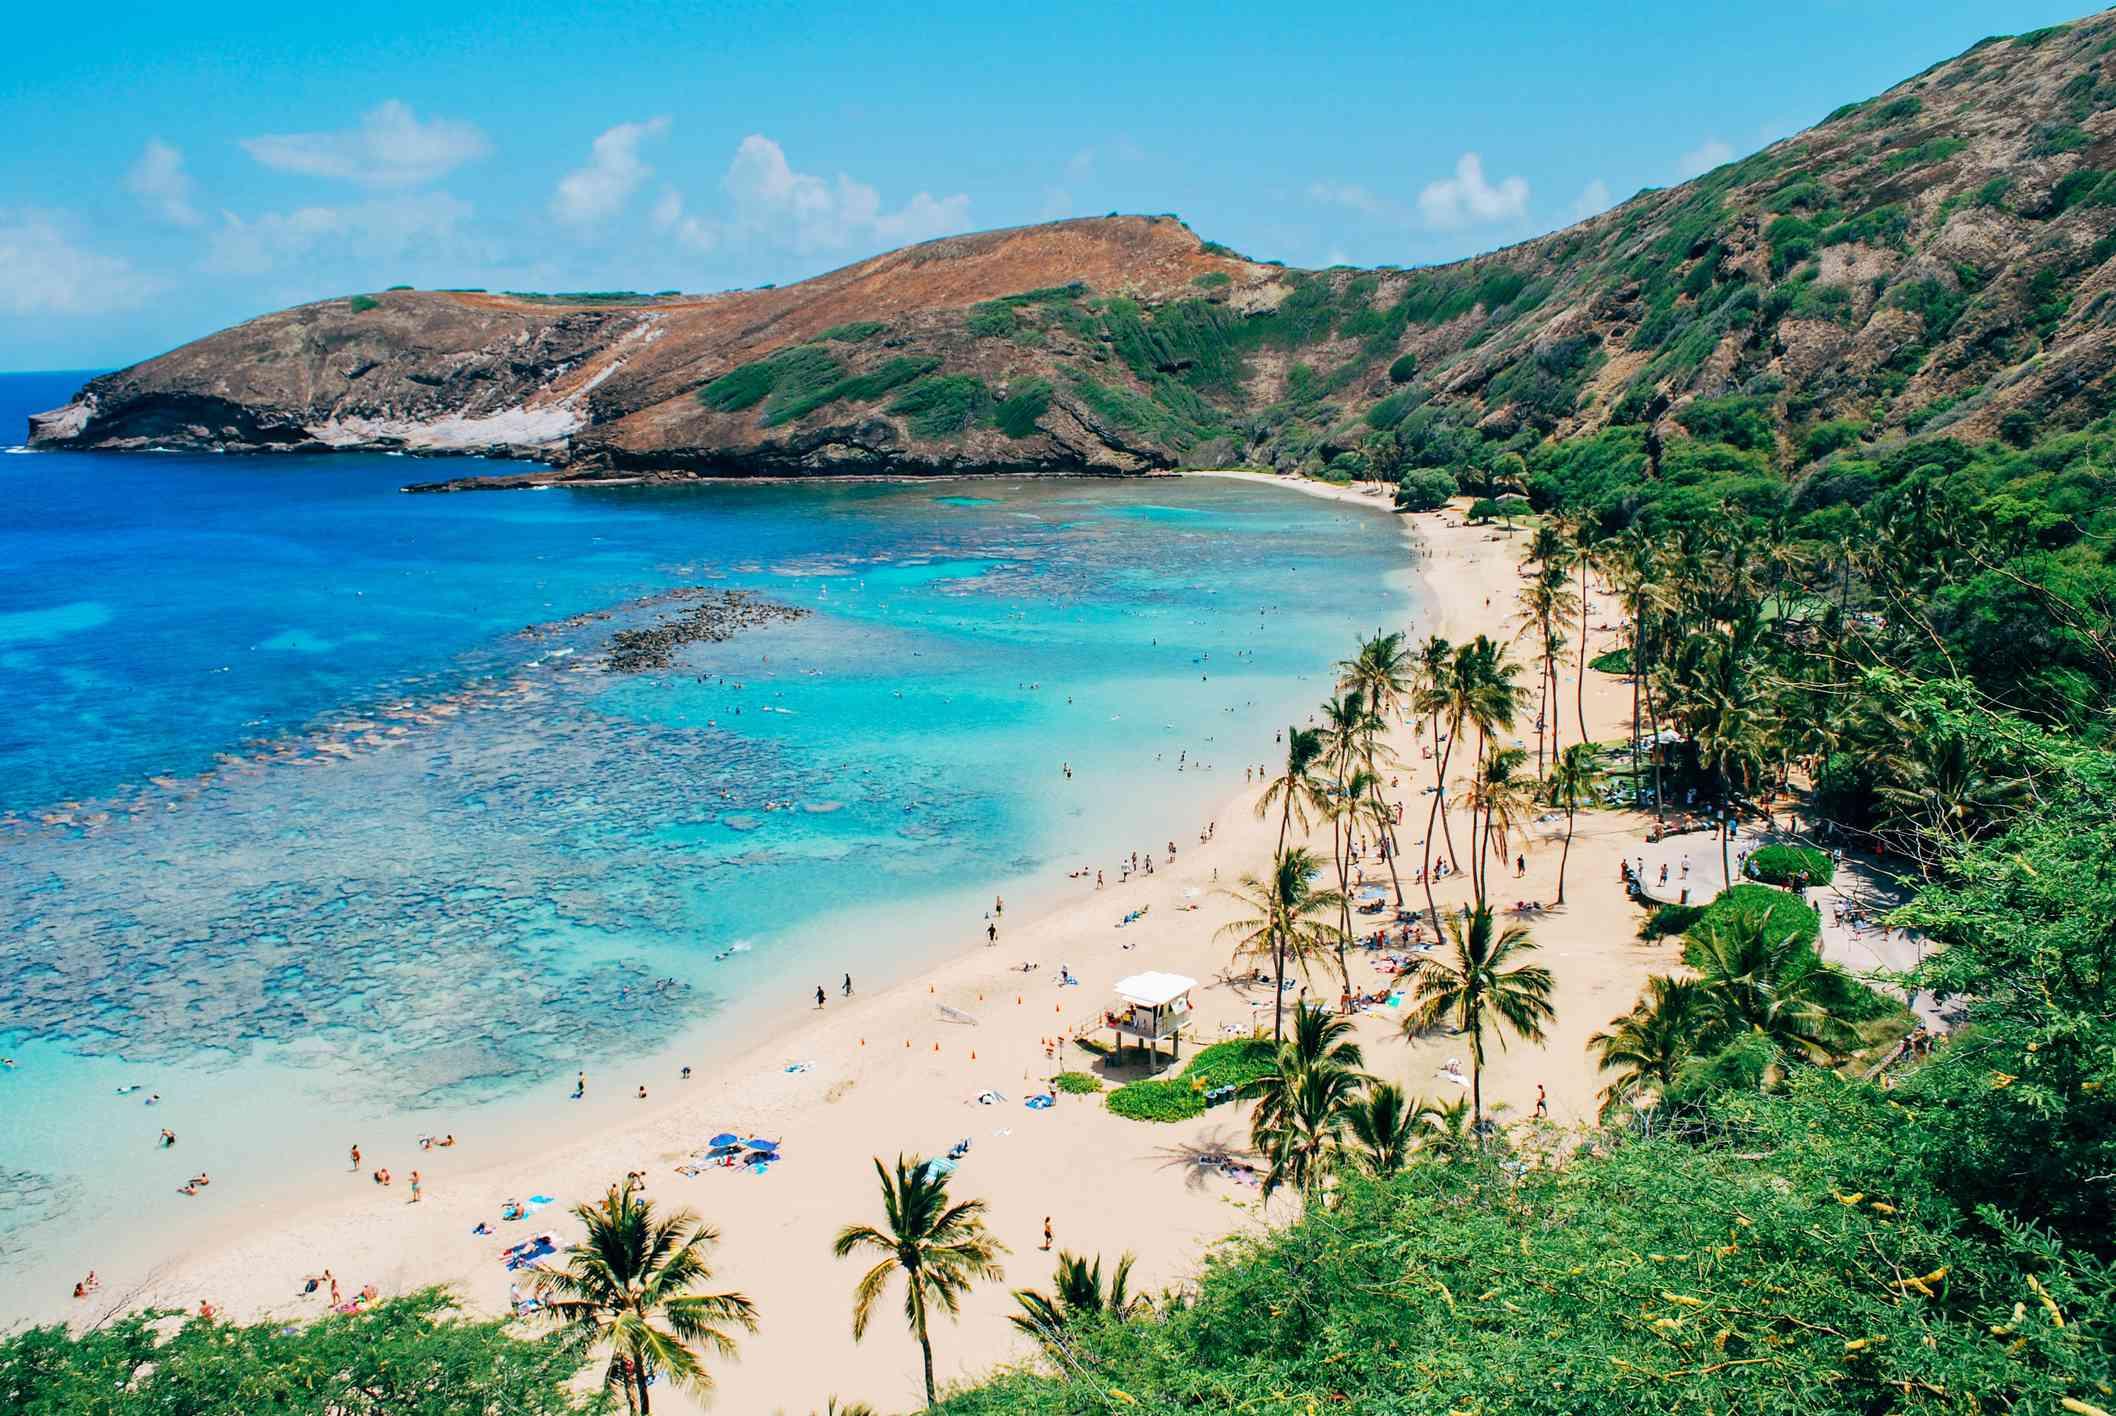 Beach in Honolulu Hawaii